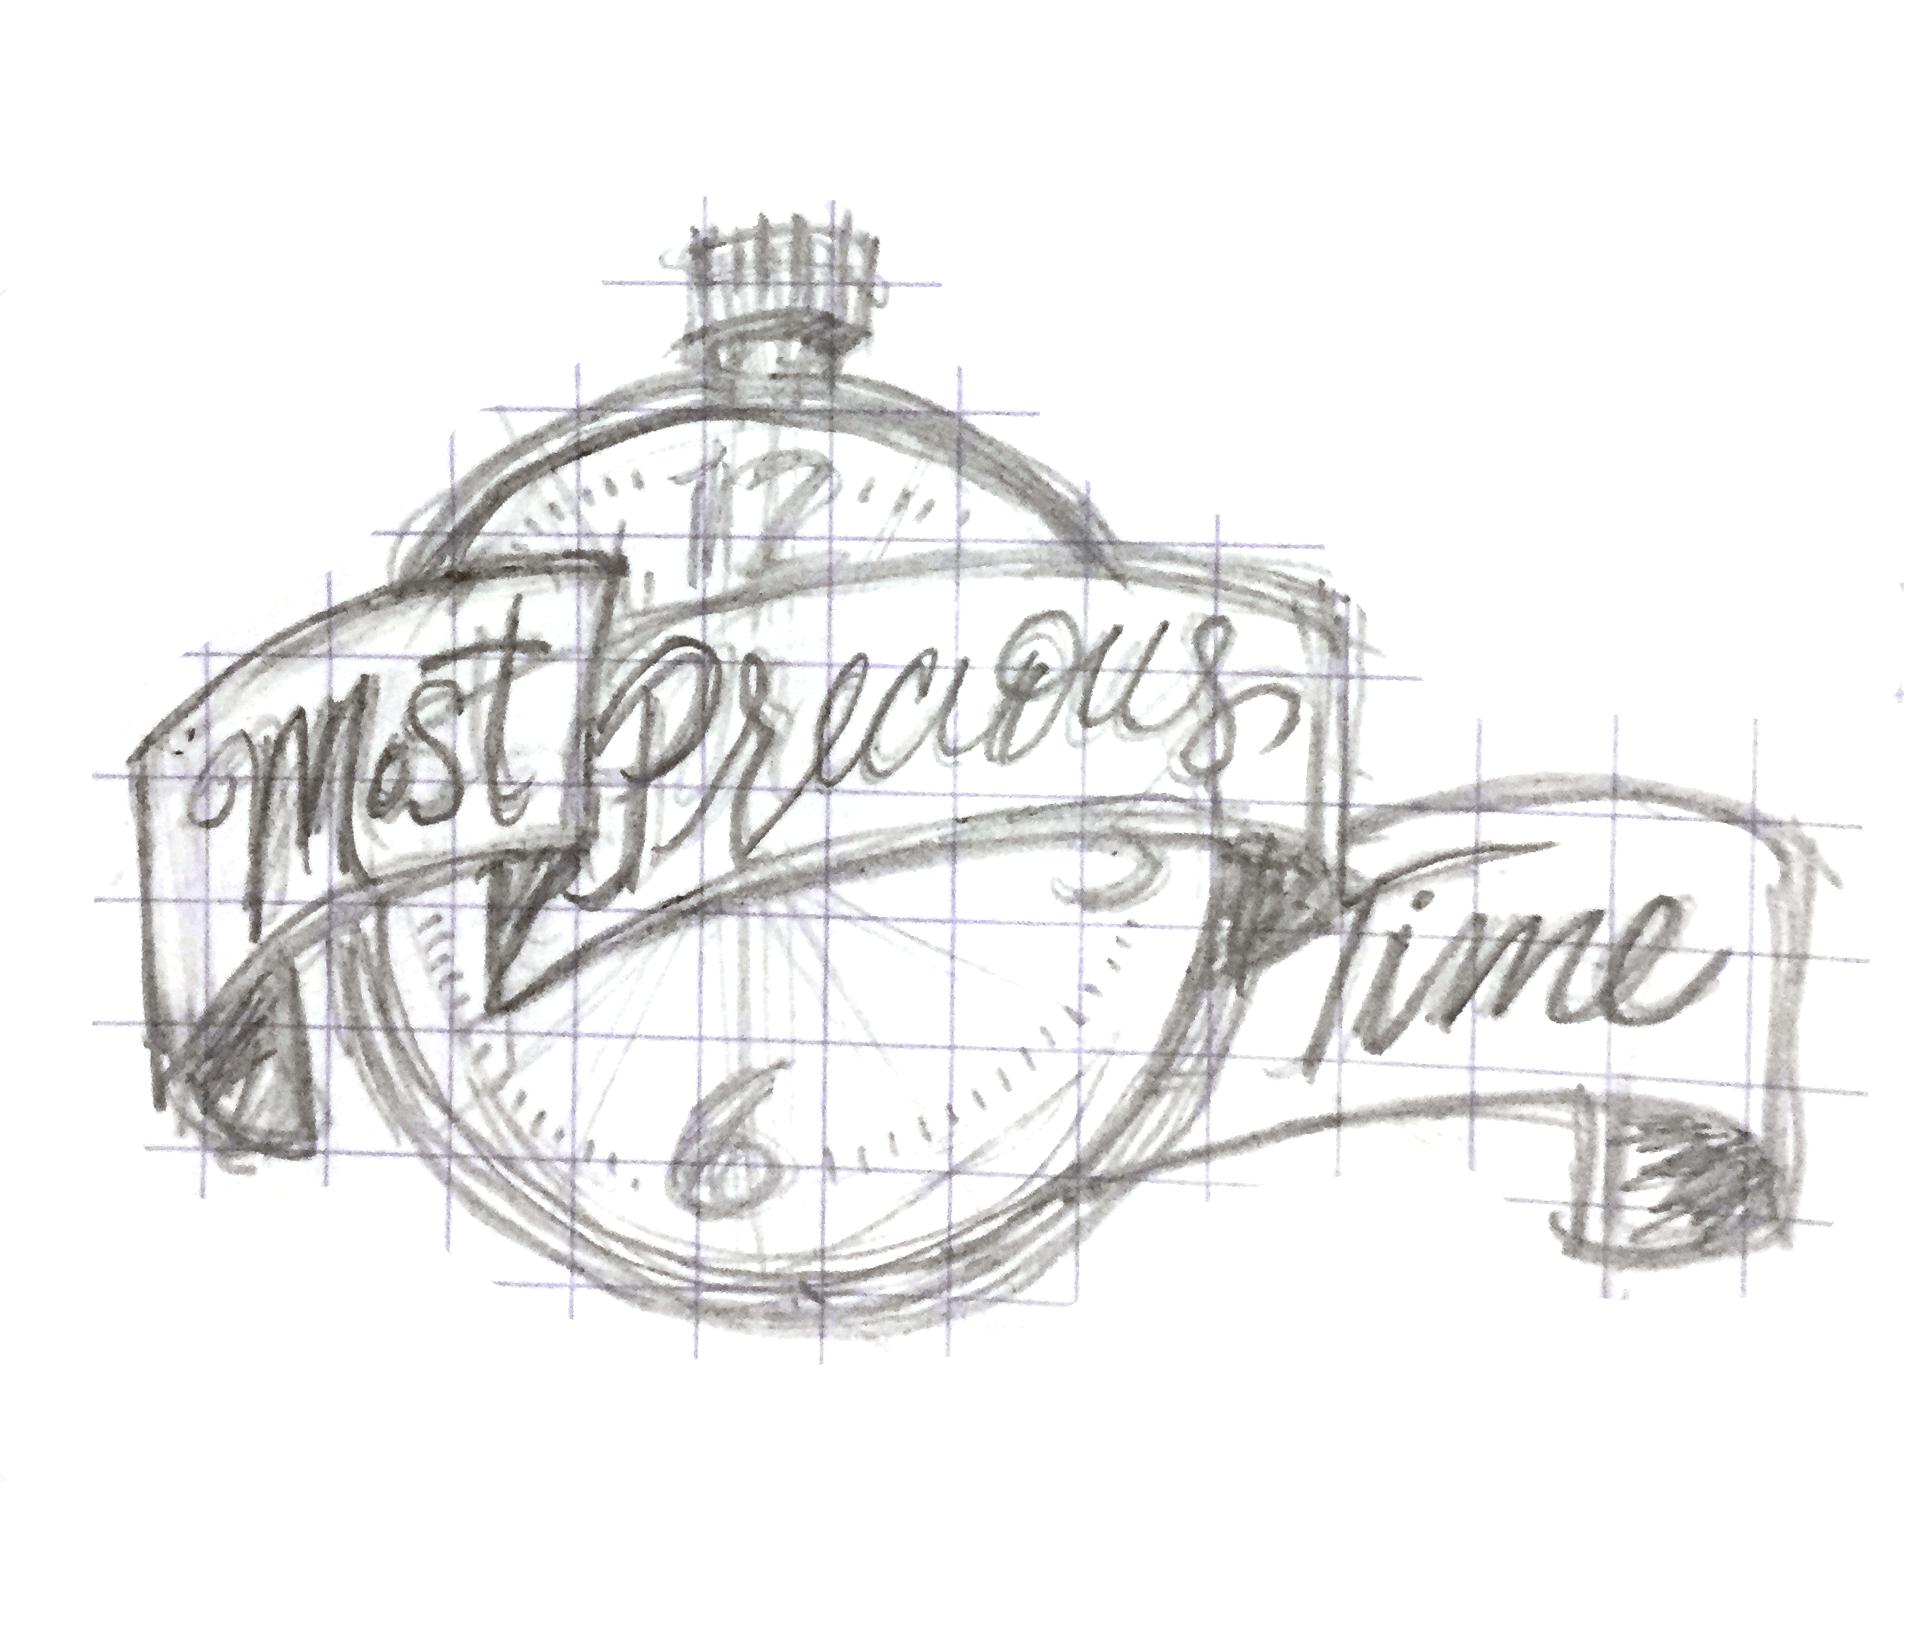 Time idea